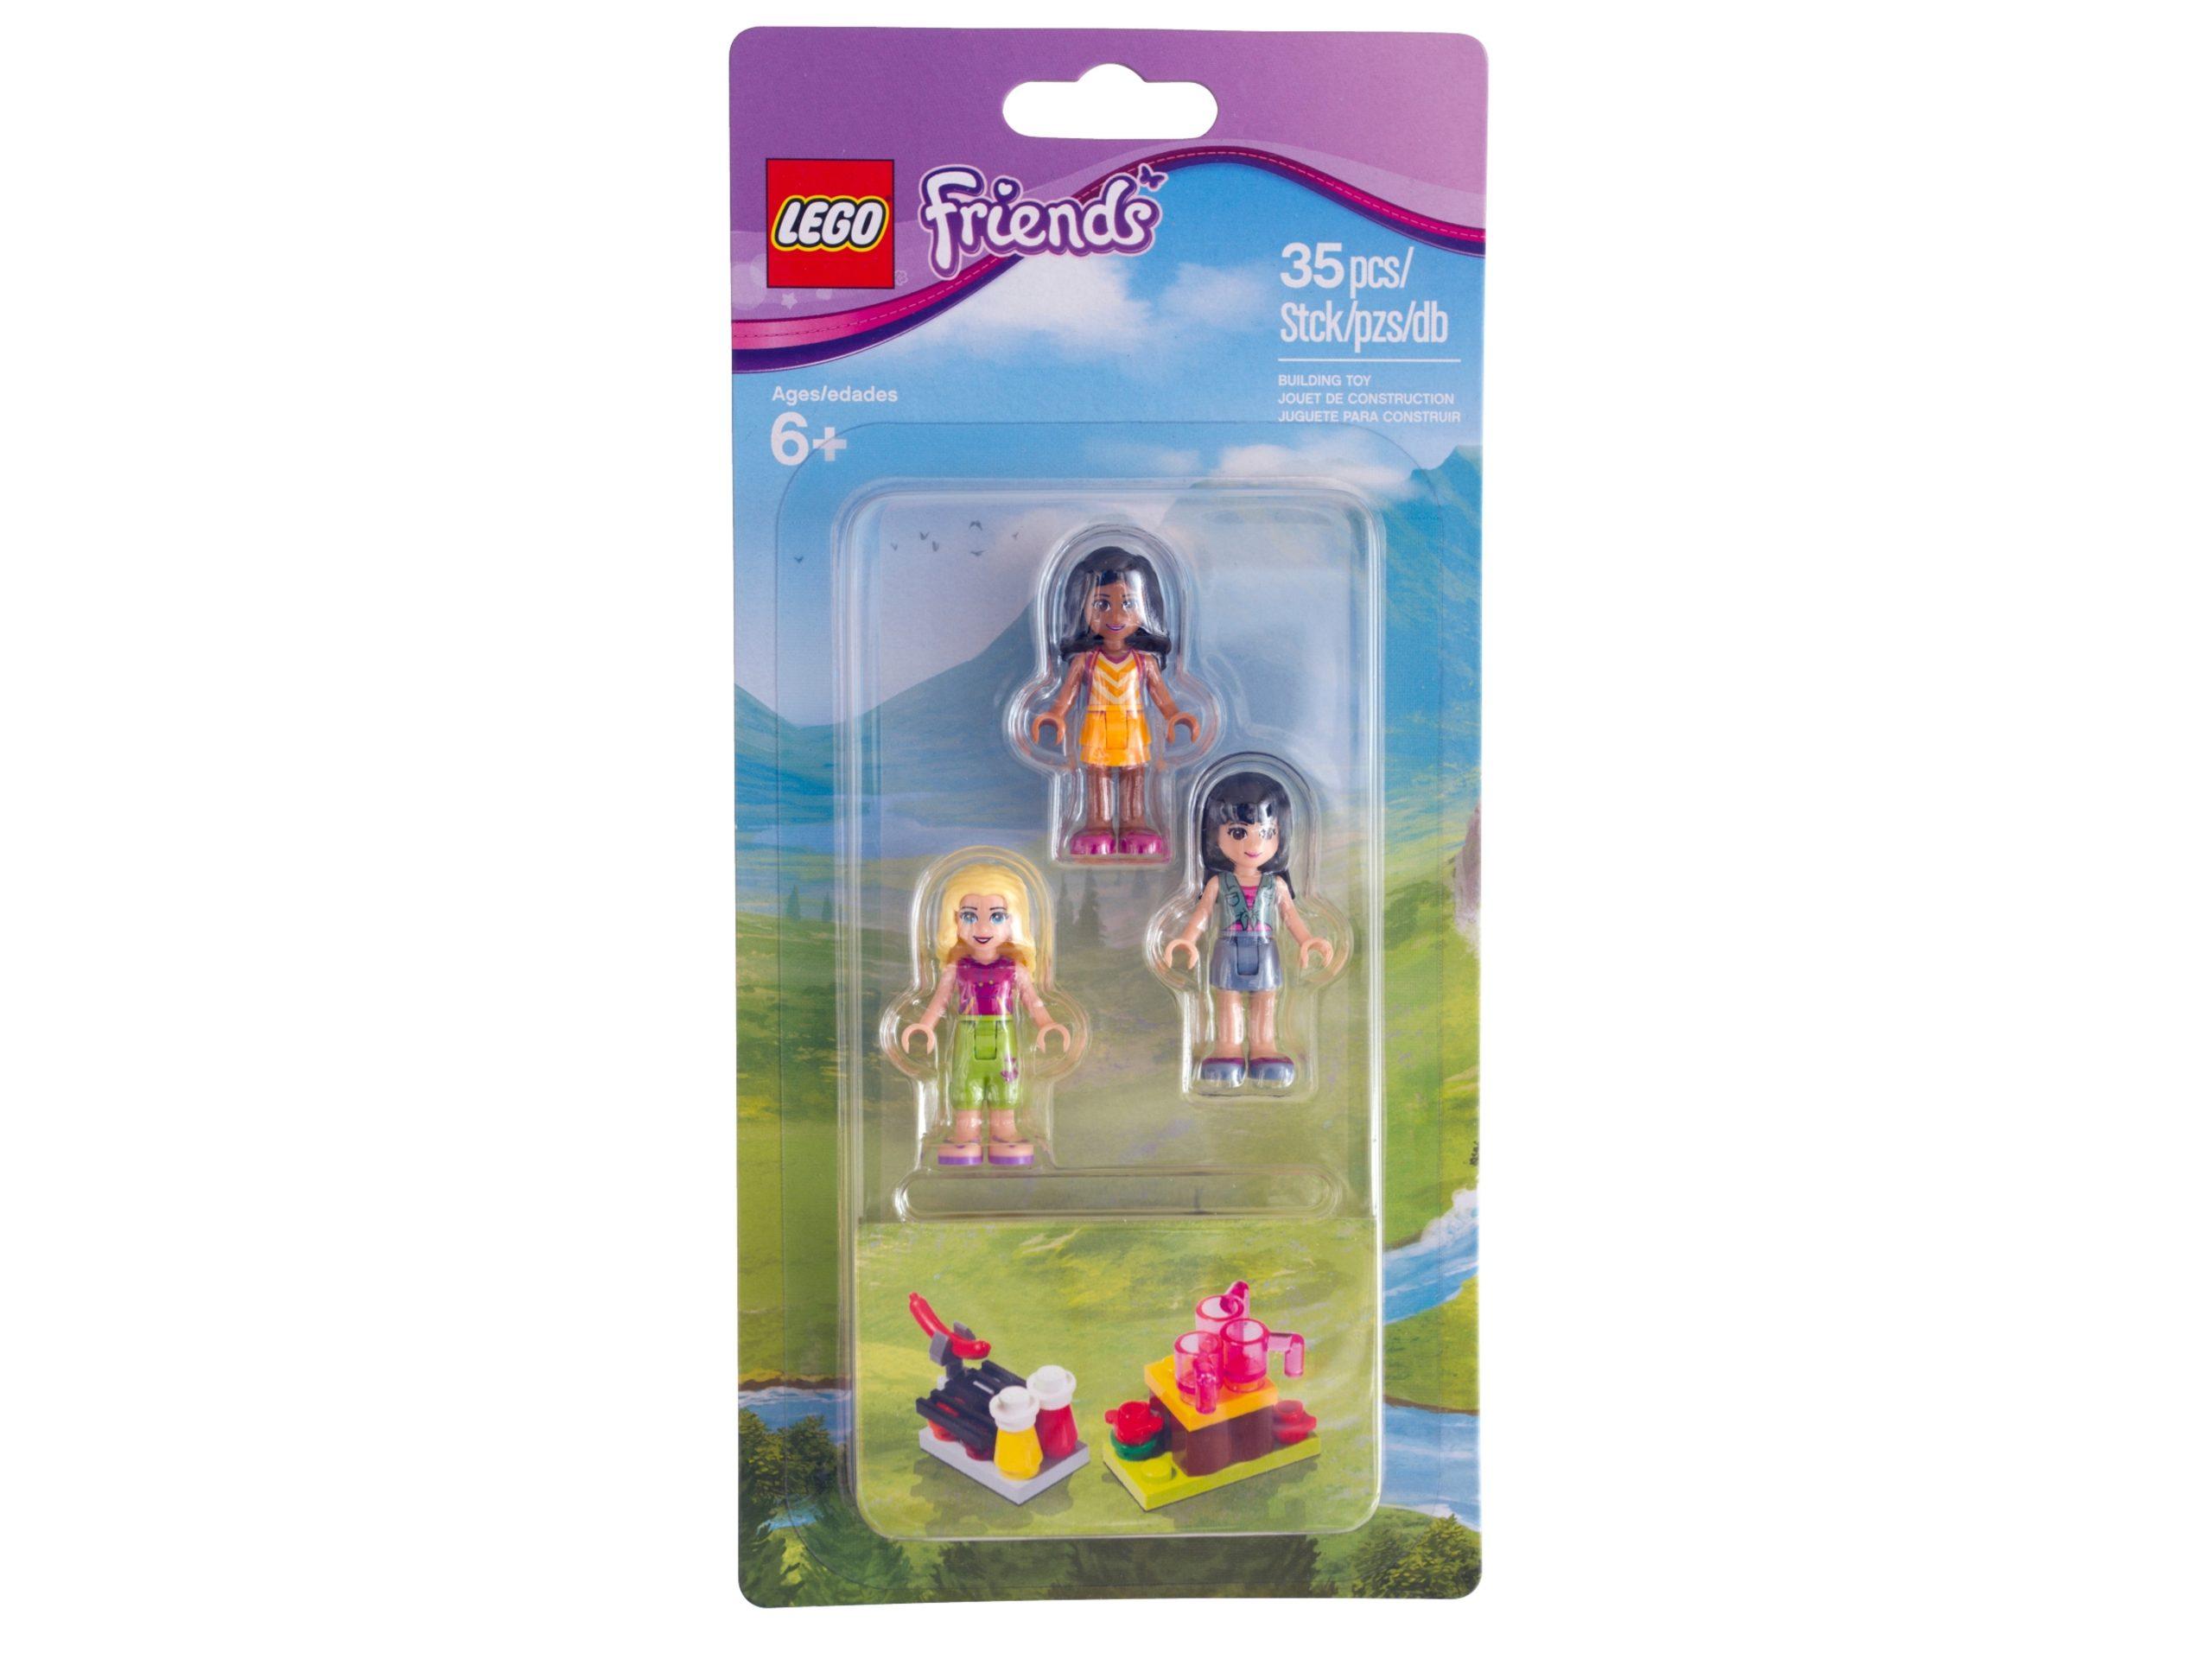 lego 853556 friends mini doll campsite set scaled